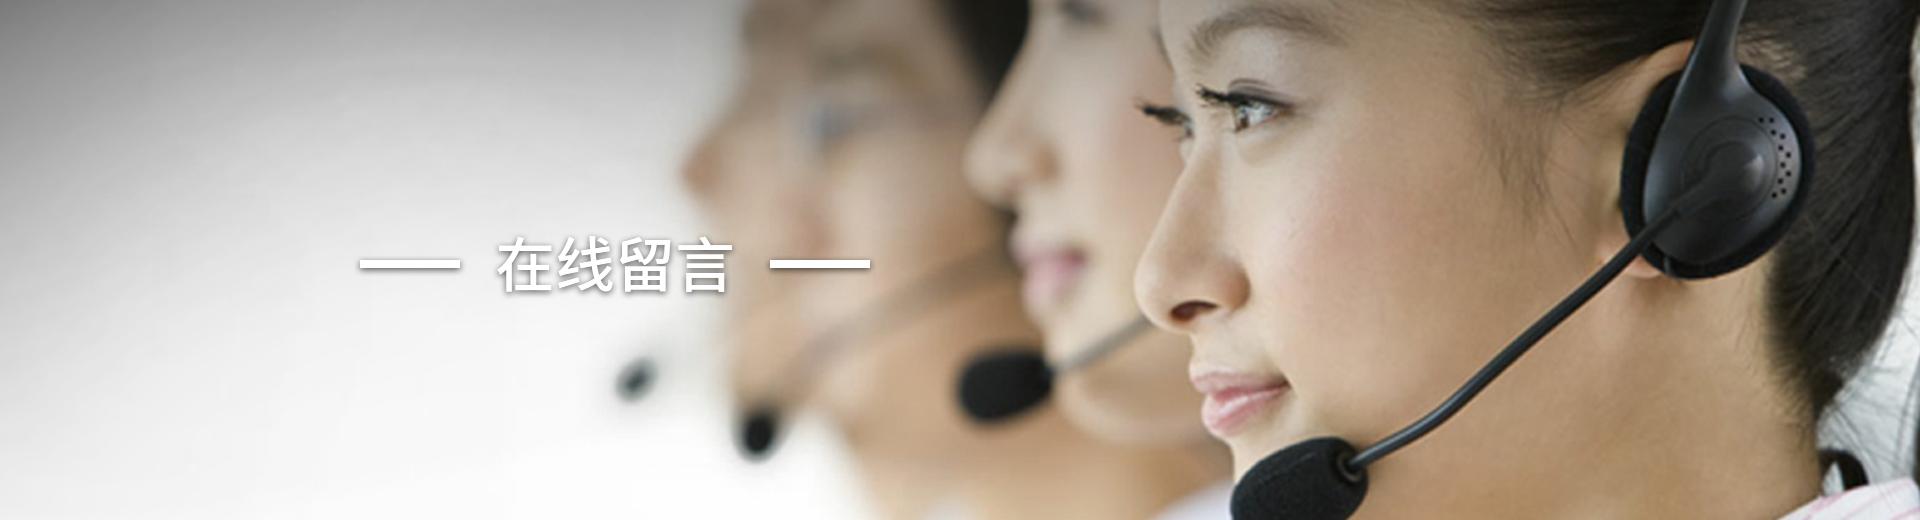 http://www.chinaweidun.com/data/upload/202008/20200808105324_301.jpg